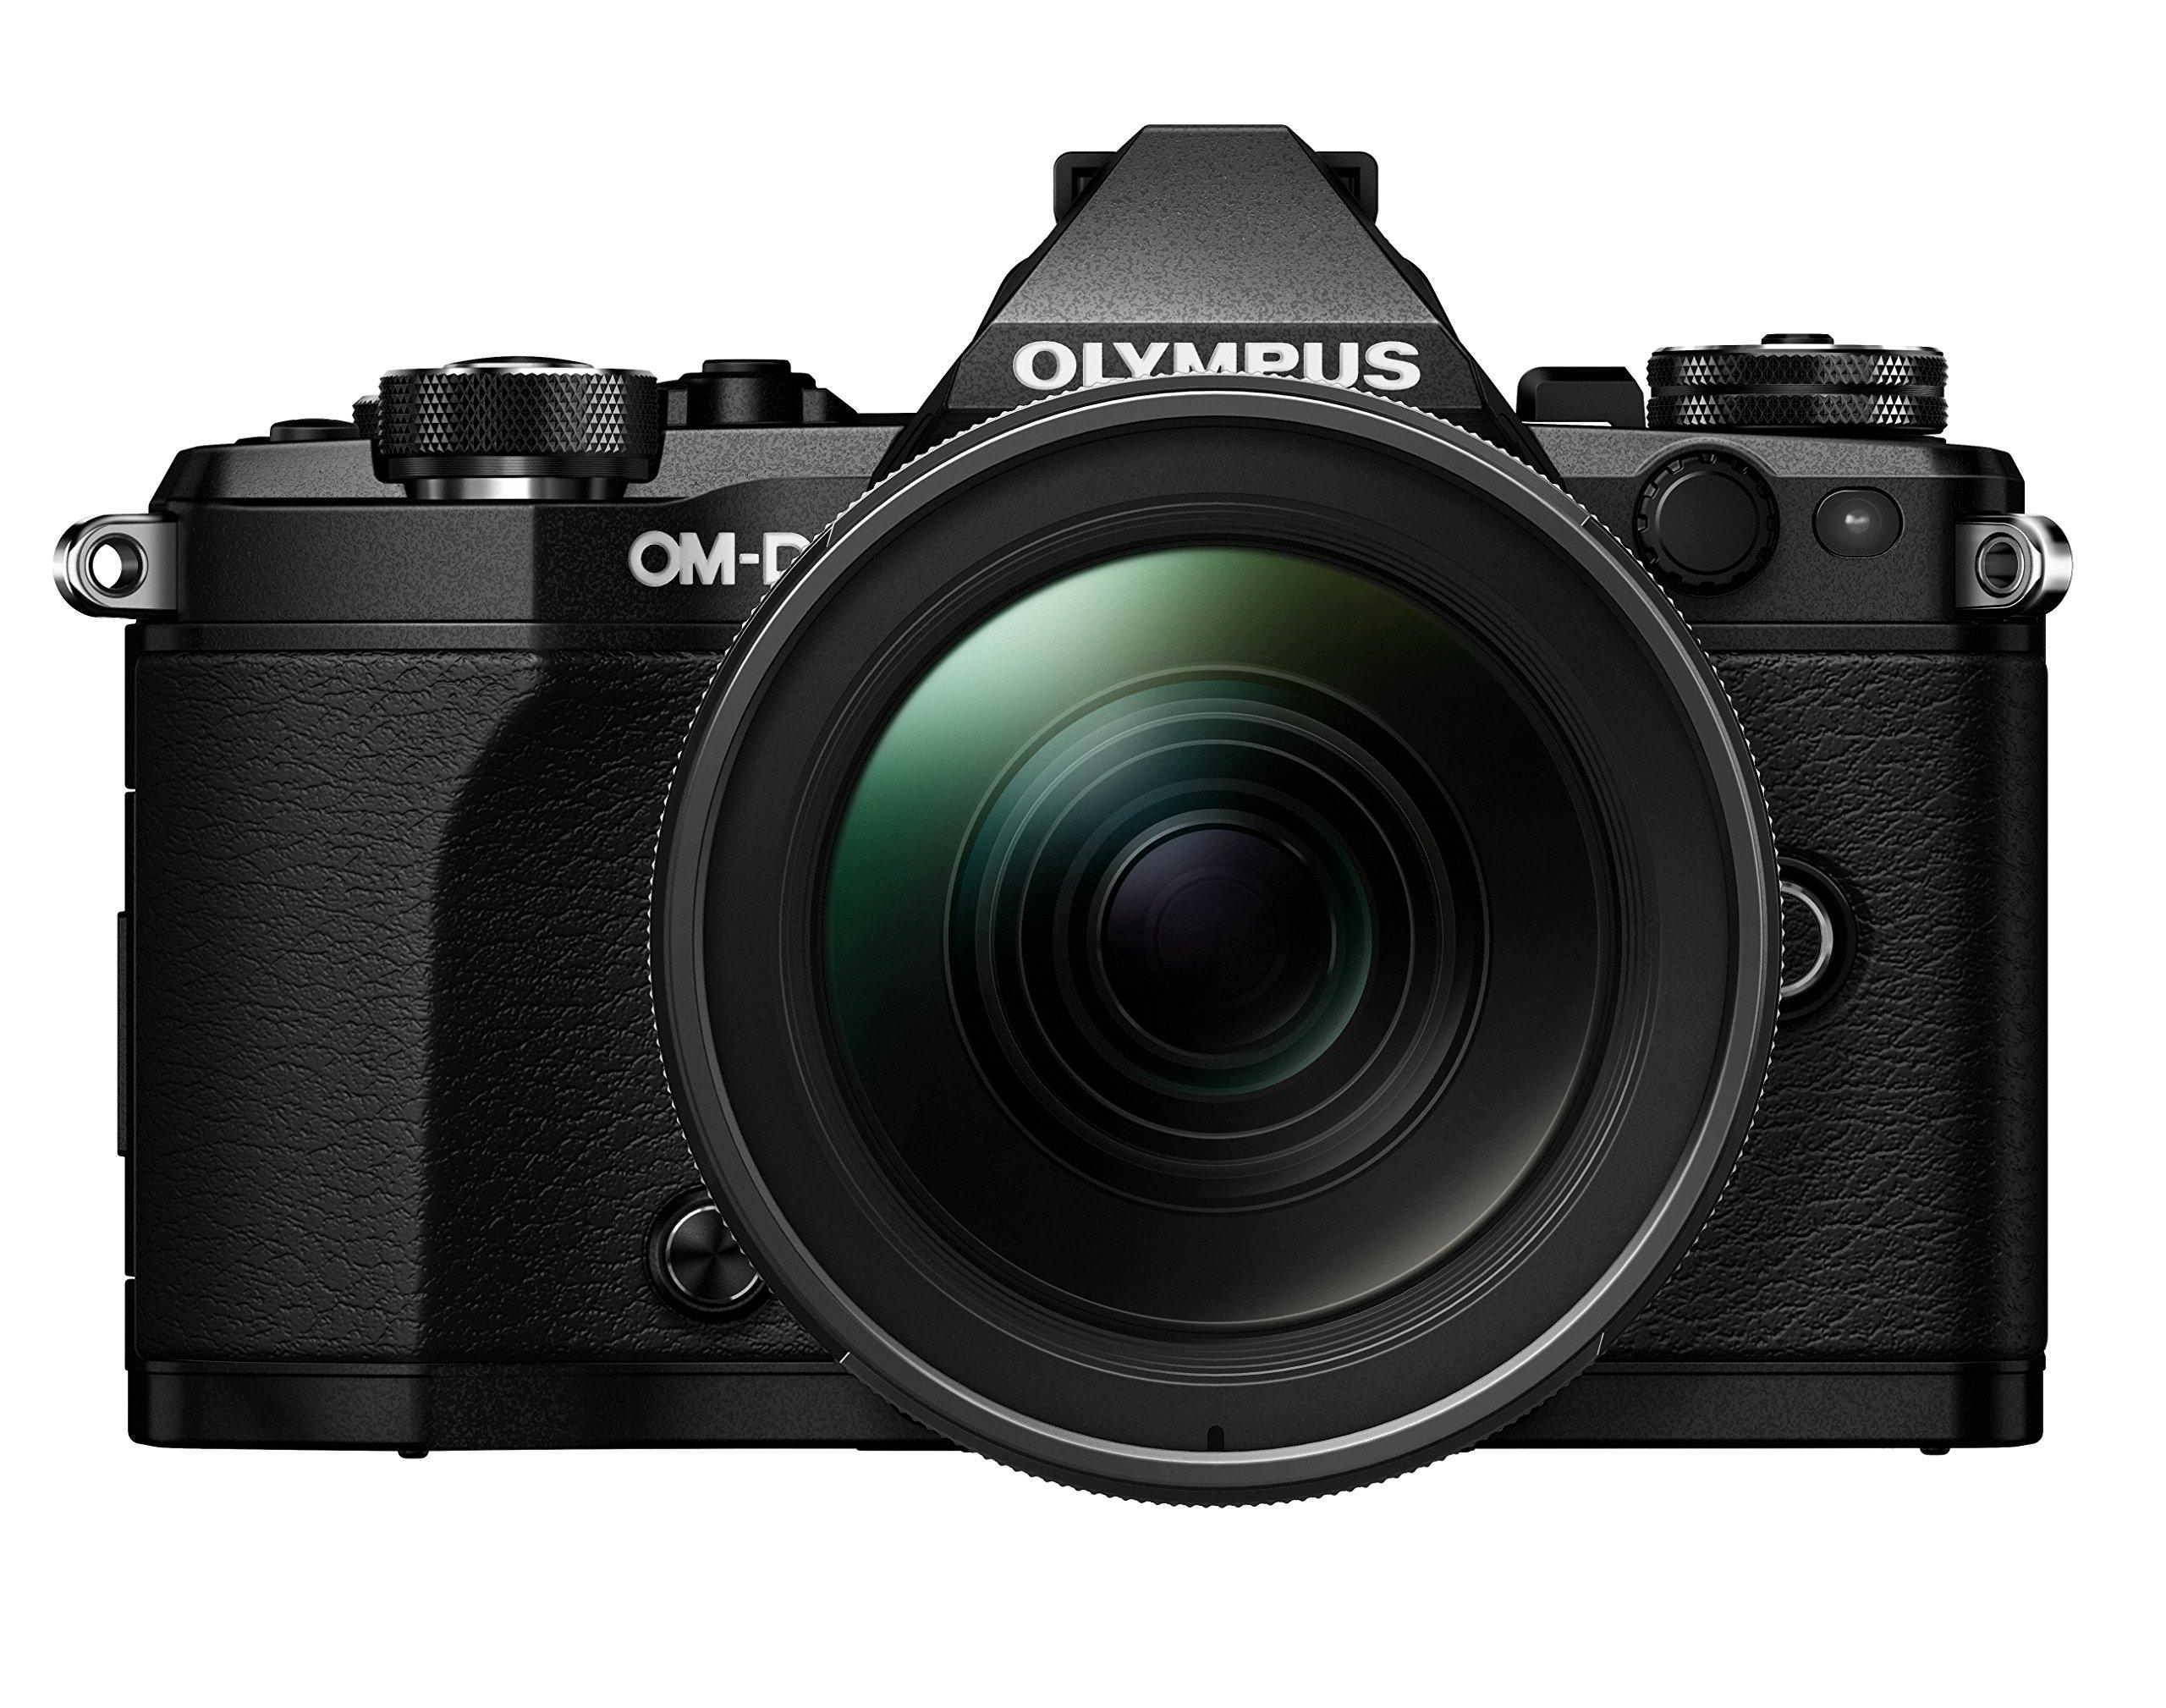 Olympus E-M5II 1240 Kit Fotocamera Professionale OM-D EM5 Mark II con Obiettivo M.Zuiko Digital ED 12-40mm, 1:2.8 Pro, Nero product image